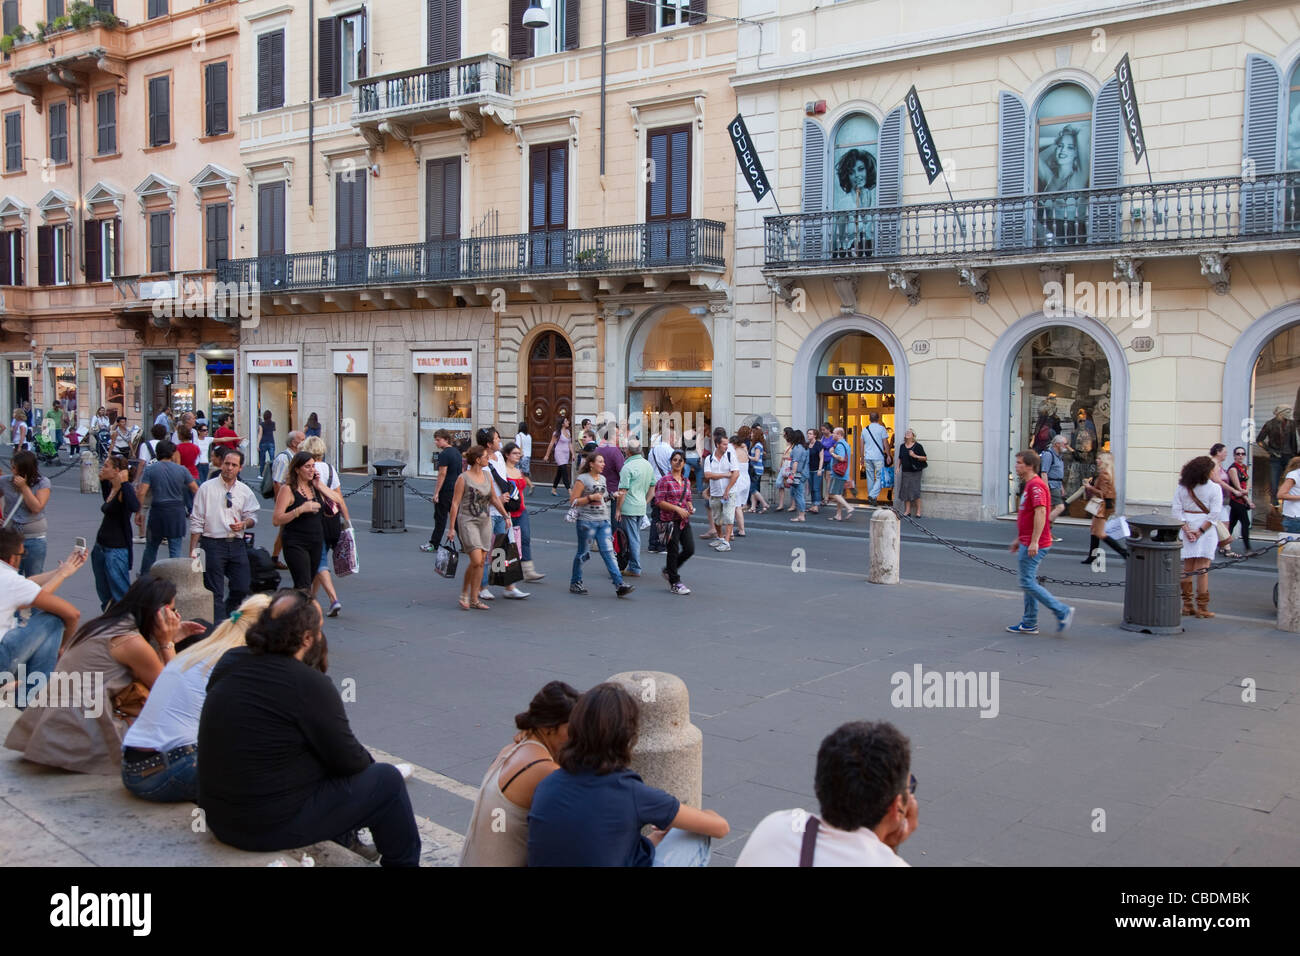 People shopping on via del corso street in rome italy for Bershka roma via del corso